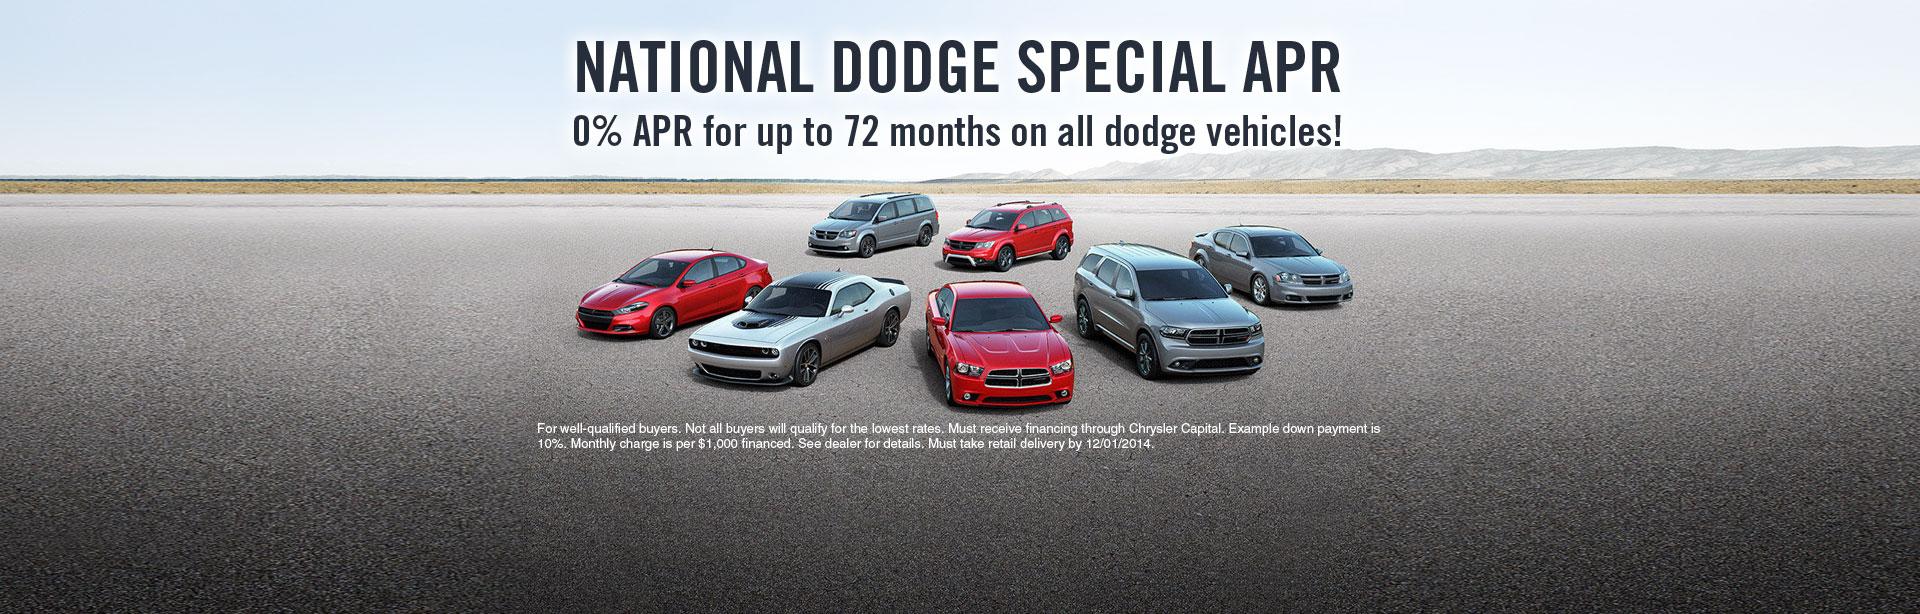 Dodge Special APR